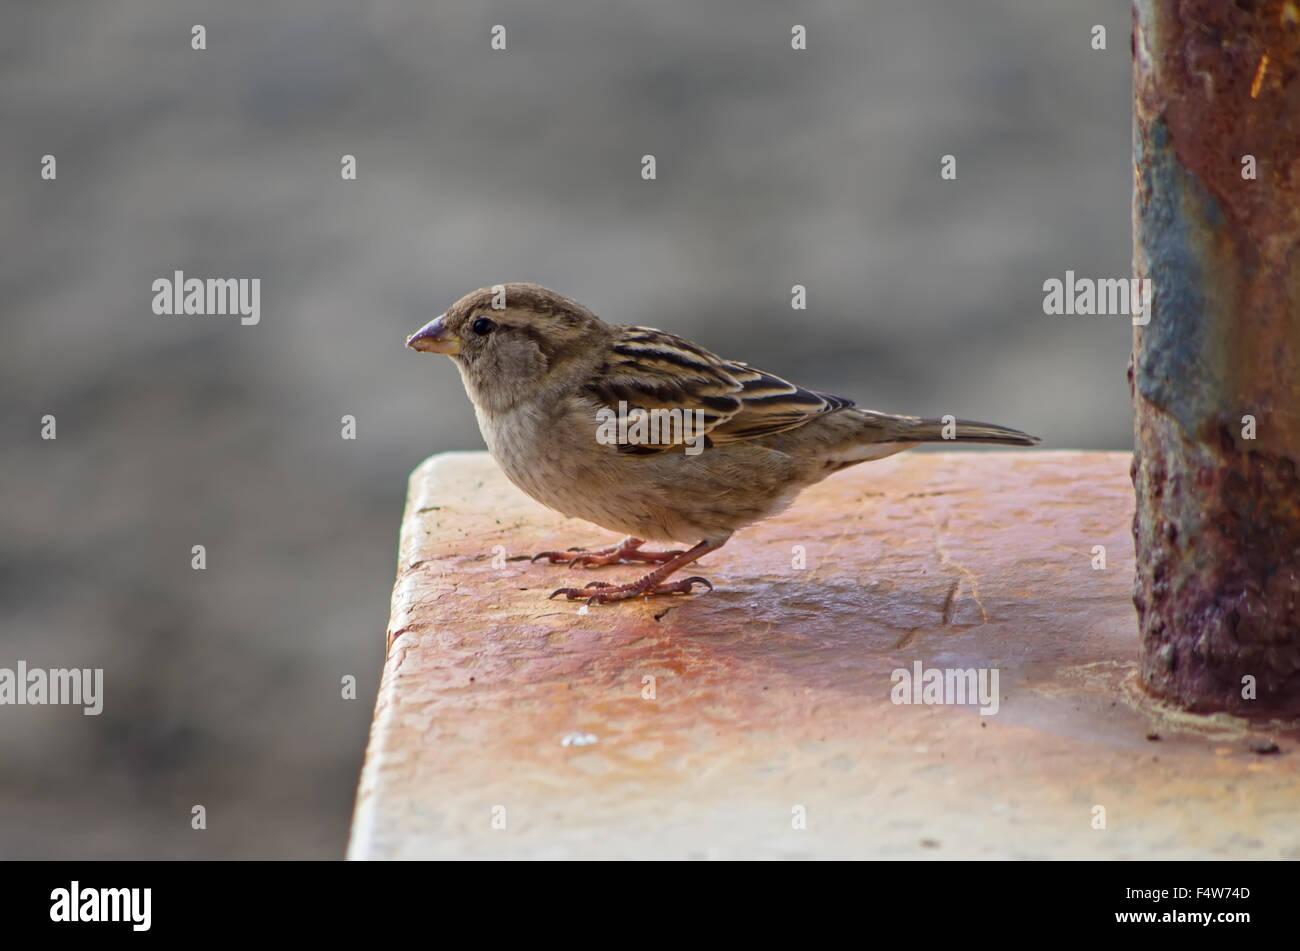 Sparrow buscando algo para comer cerca de casa interna Foto de stock